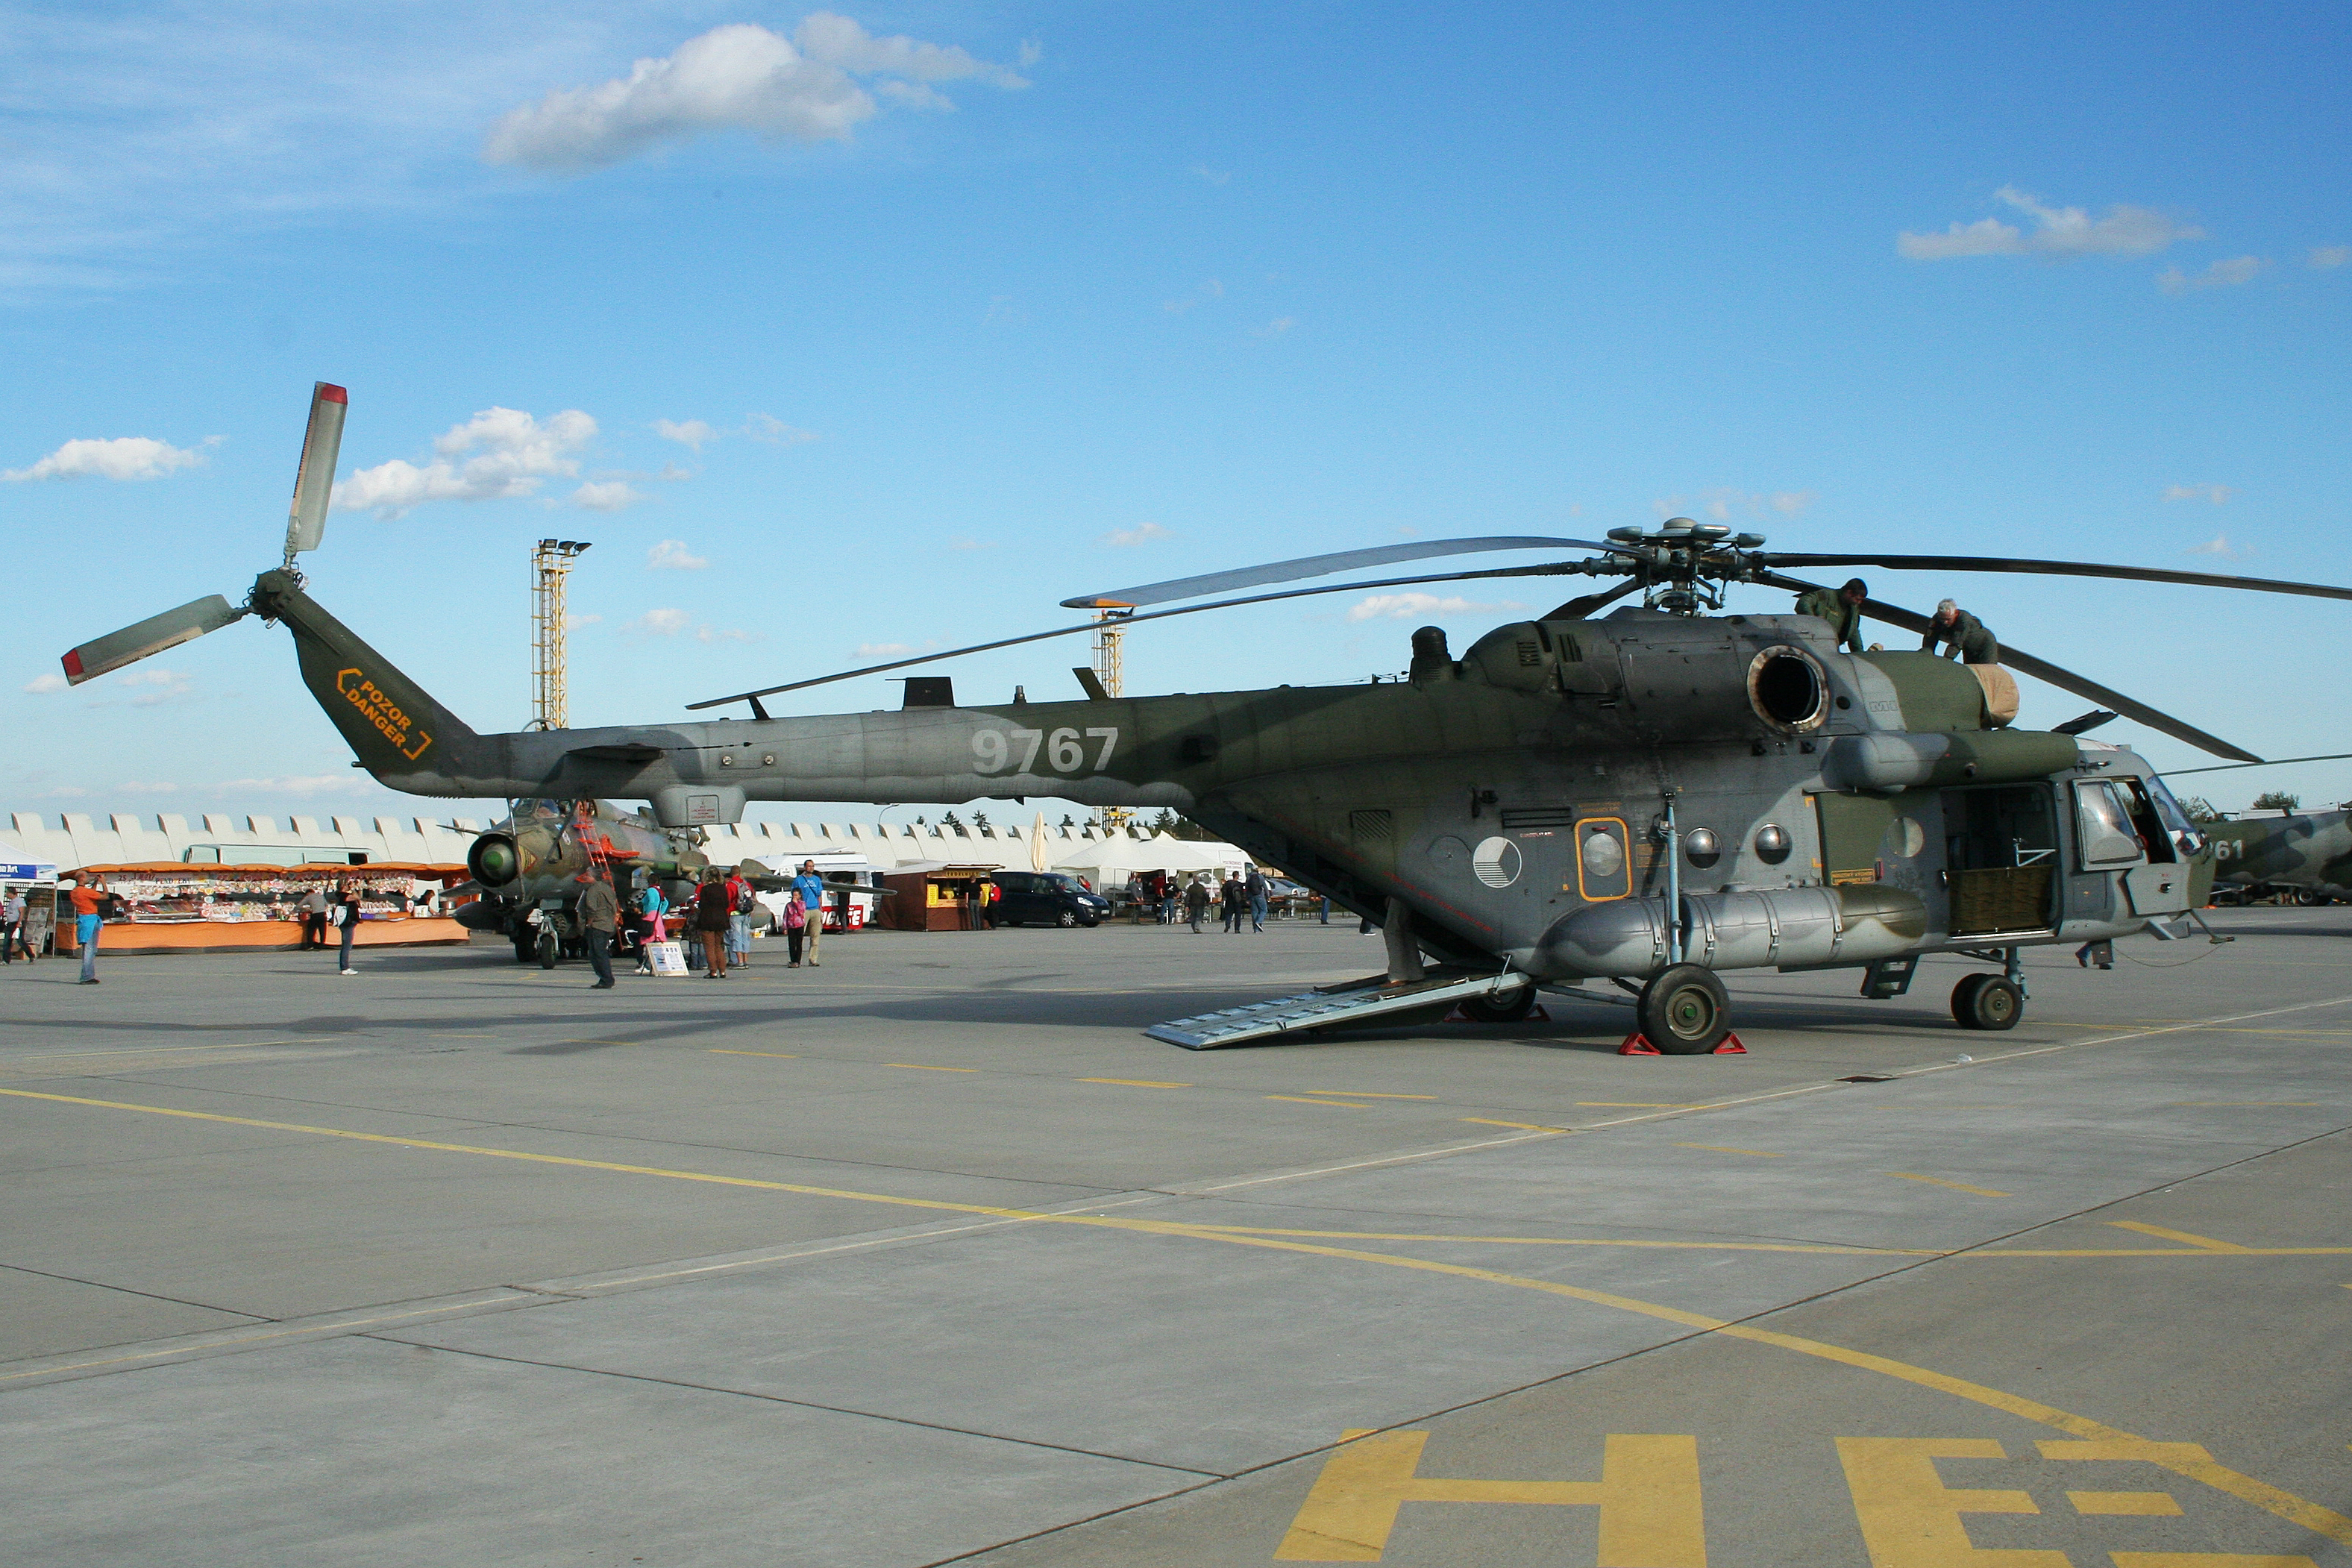 File:Mil Mi-171Sh 9767 (8126107756).jpg